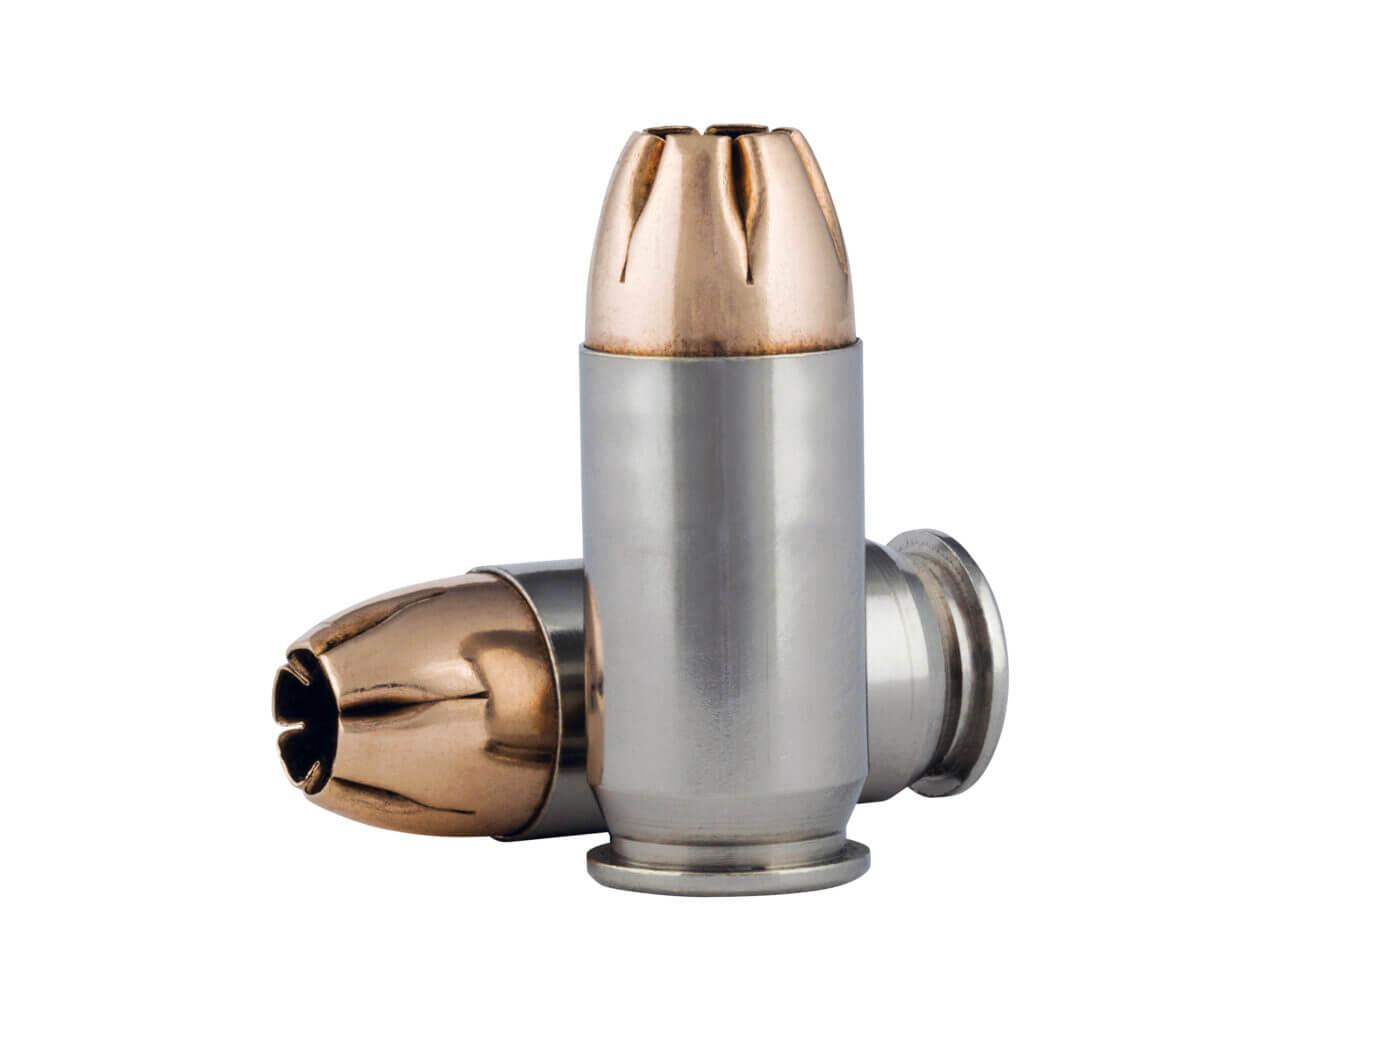 Federal Hydra-Shok Deep cartridge in .45 ACP